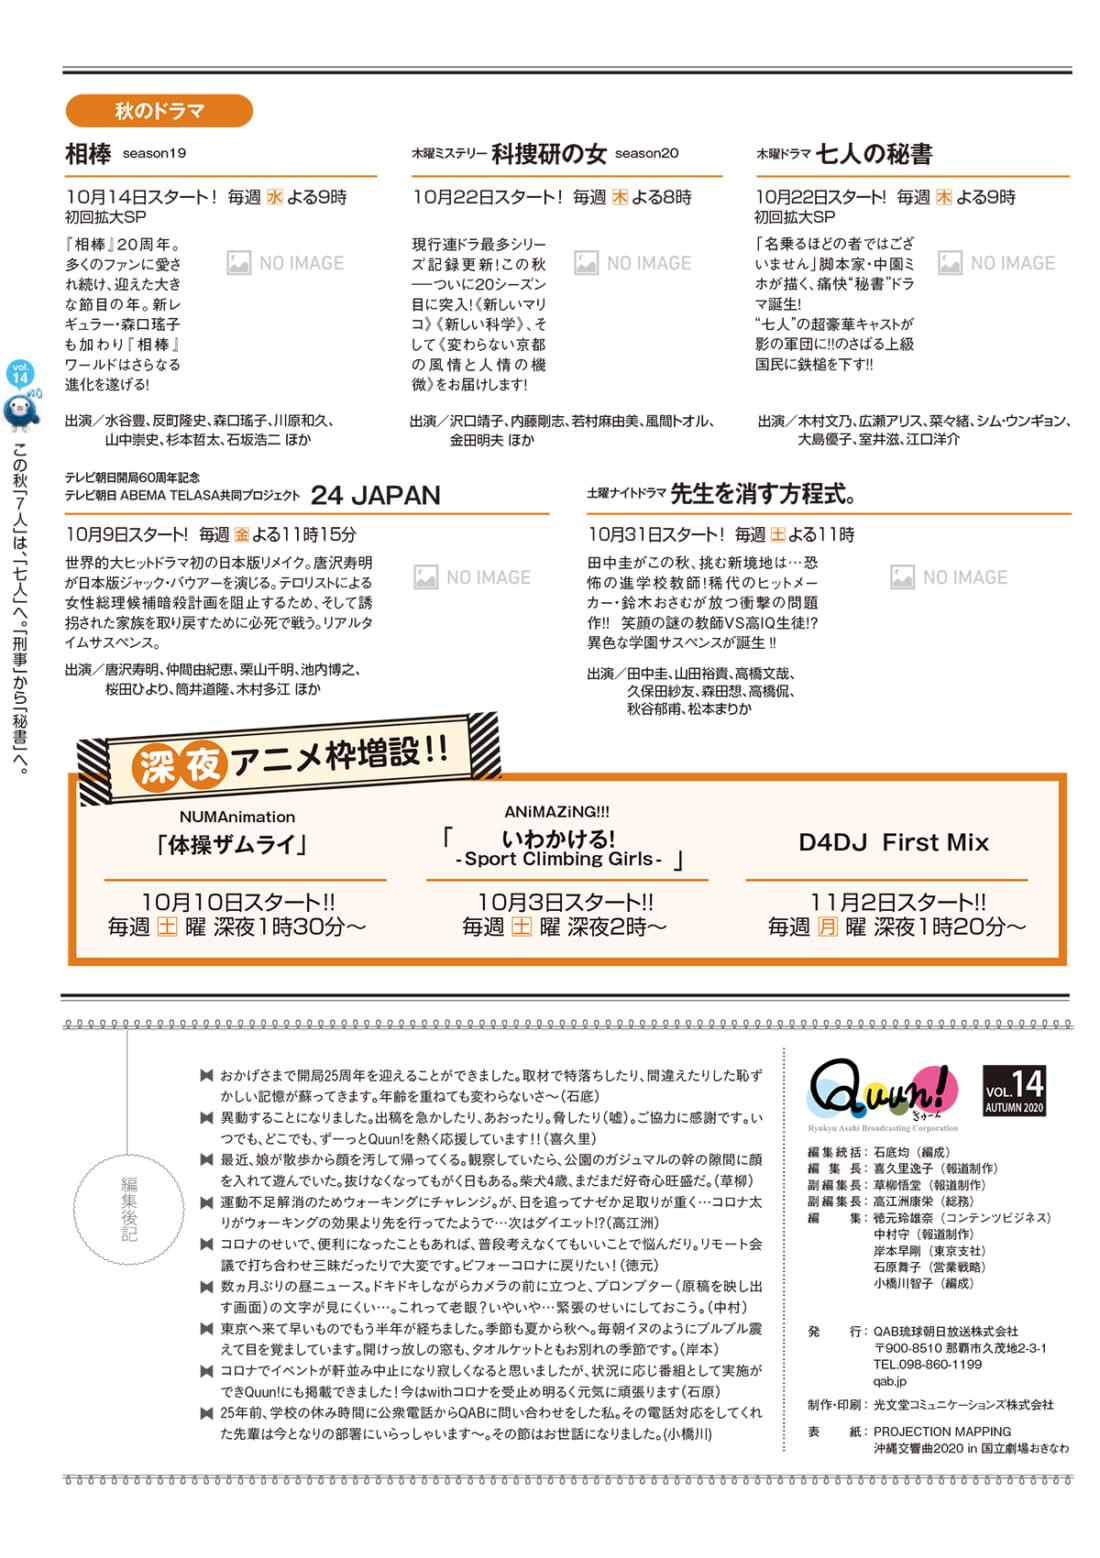 https://www.qab.co.jp/qgoro/wp-content/uploads/quun_1415-1100x1558.jpg